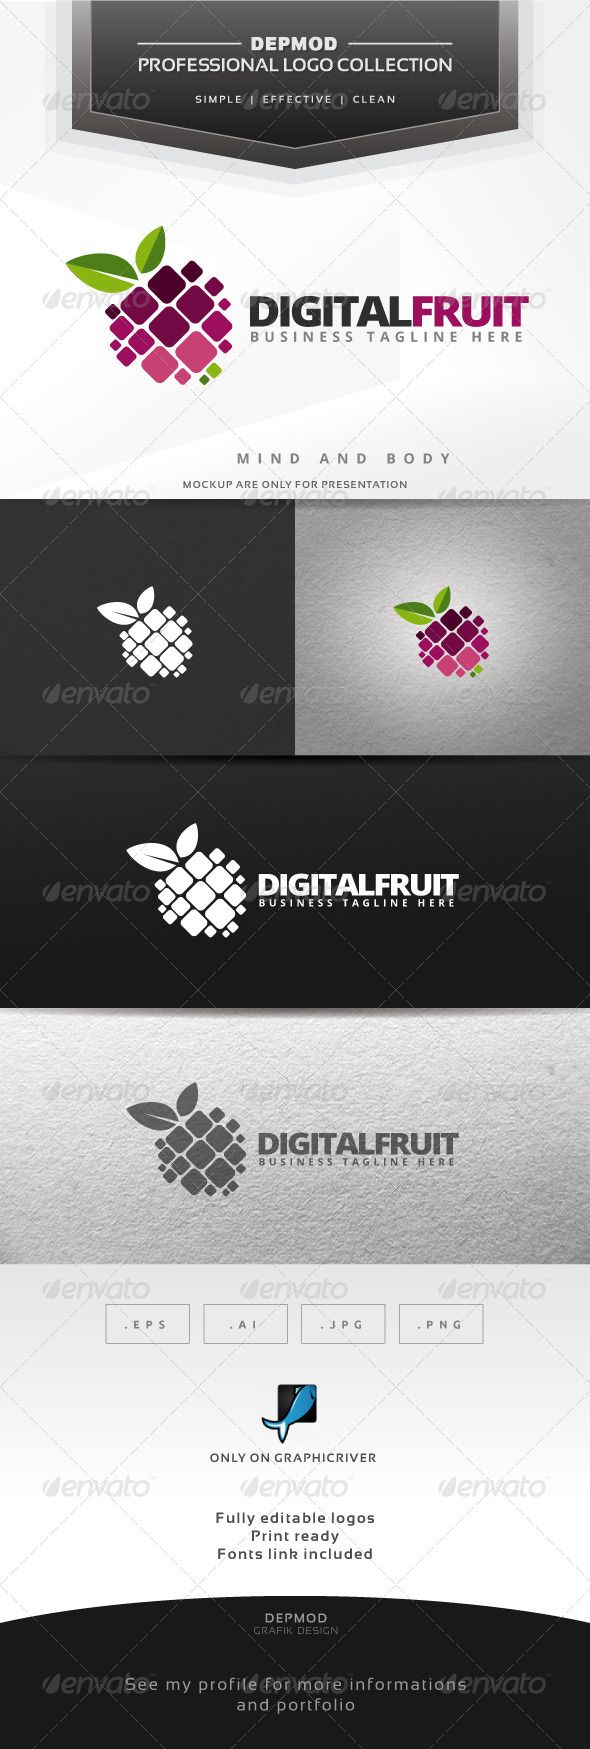 Digital Fruit - Logo Design Template Vector #logotype Download it here: http://graphicriver.net/item/digital-fruit-logo/6424359?s_rank=412?ref=nesto